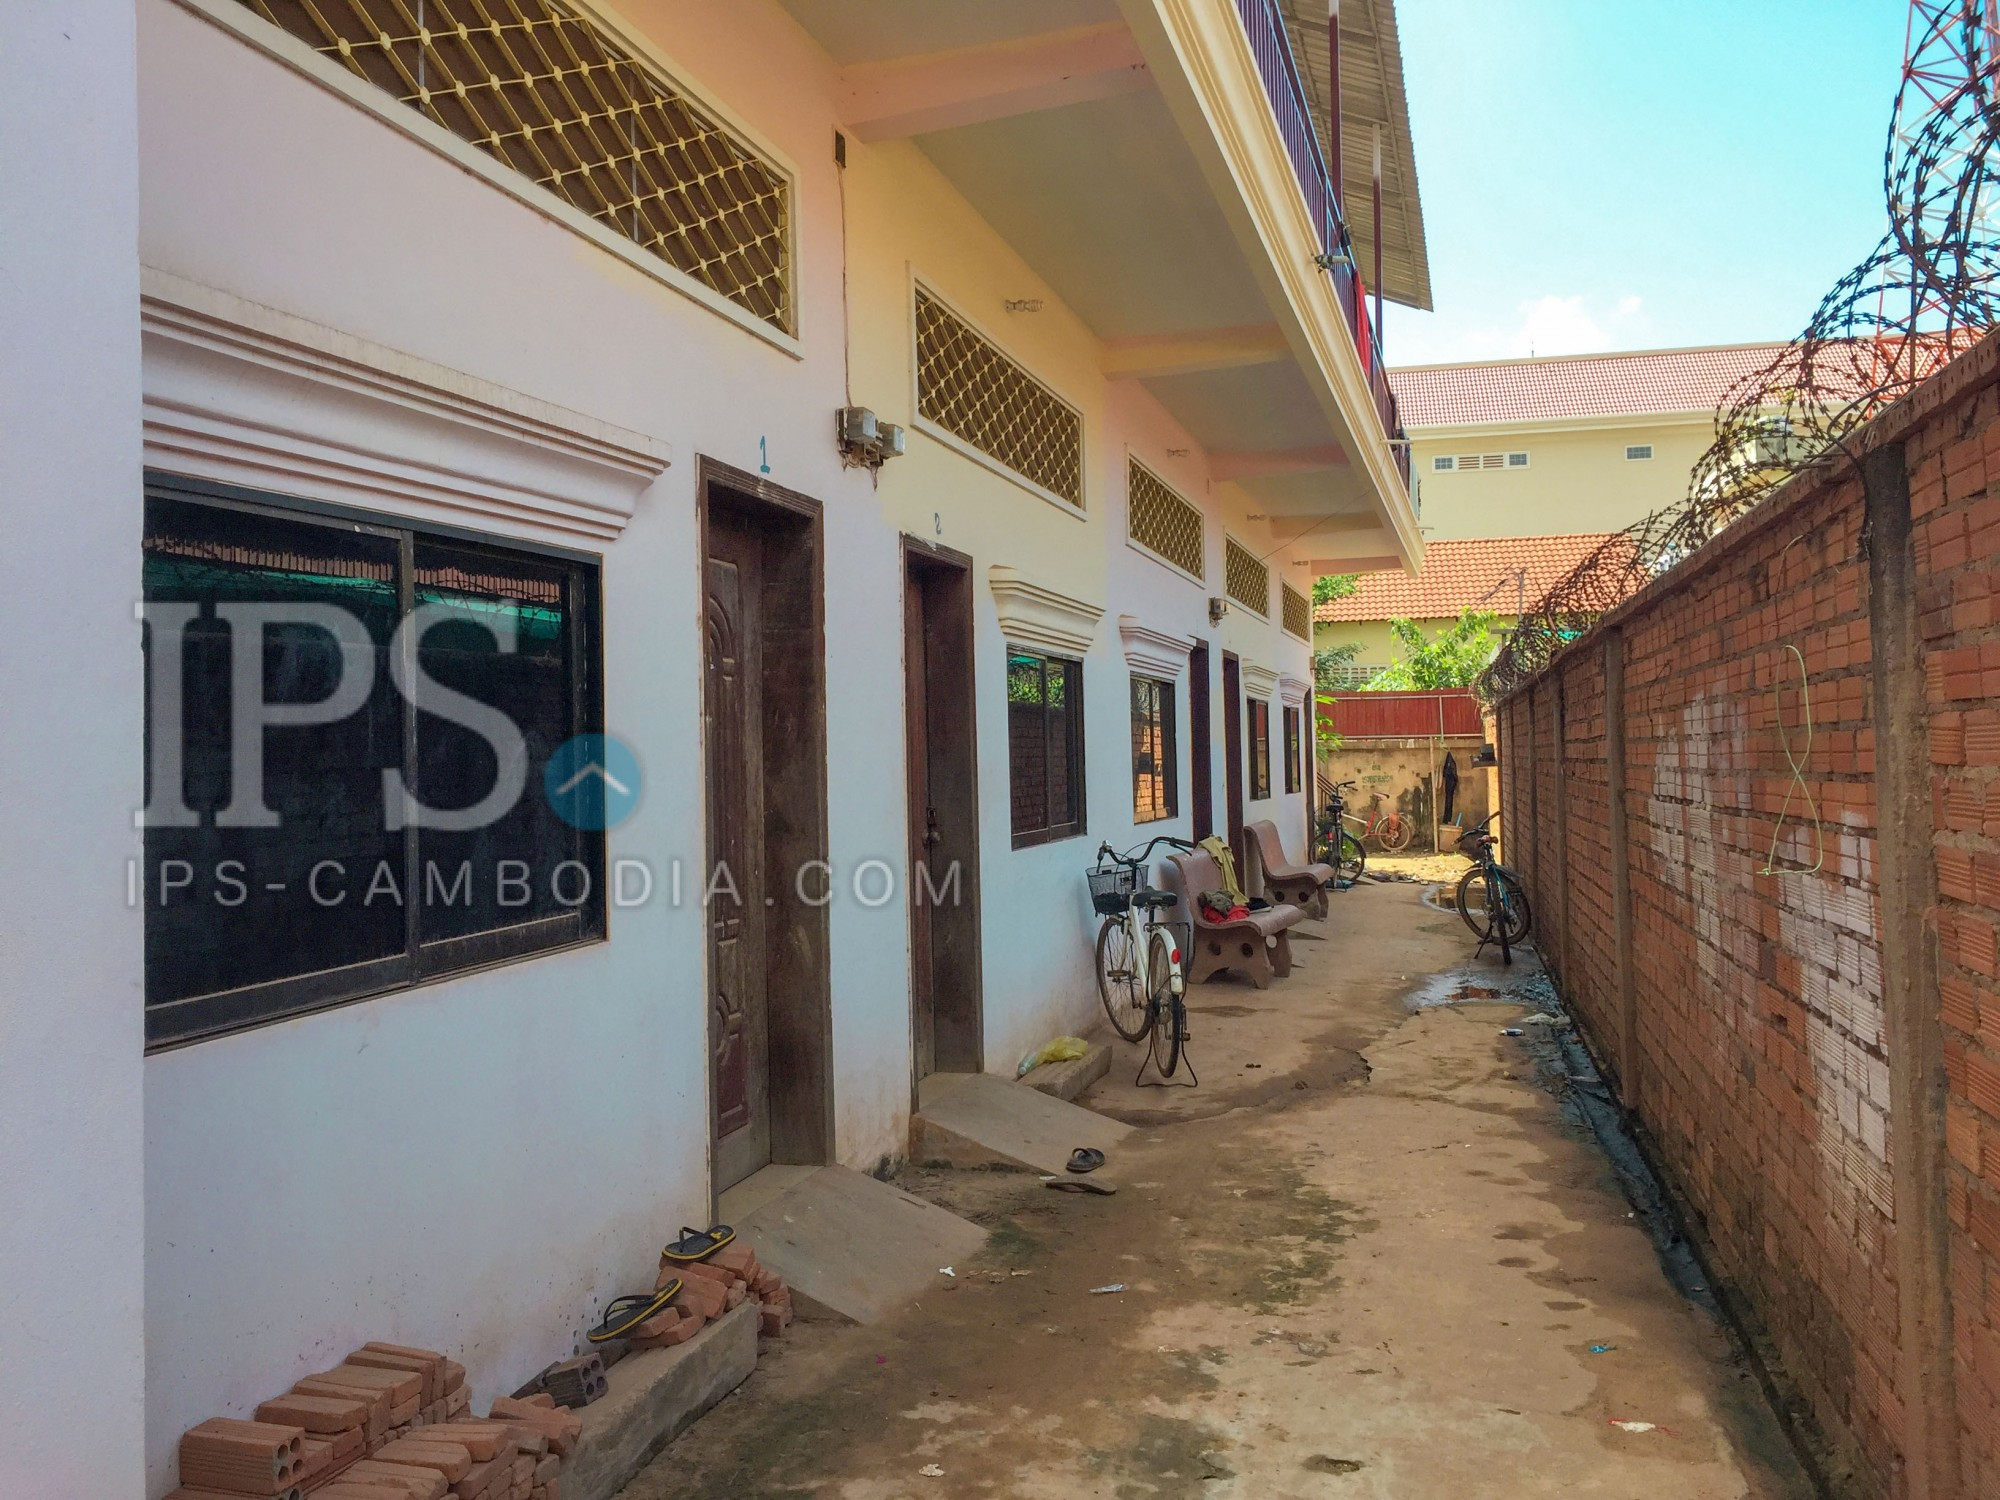 10 Bedroom House For Sale - Sala Kamreuk, Siem Reap